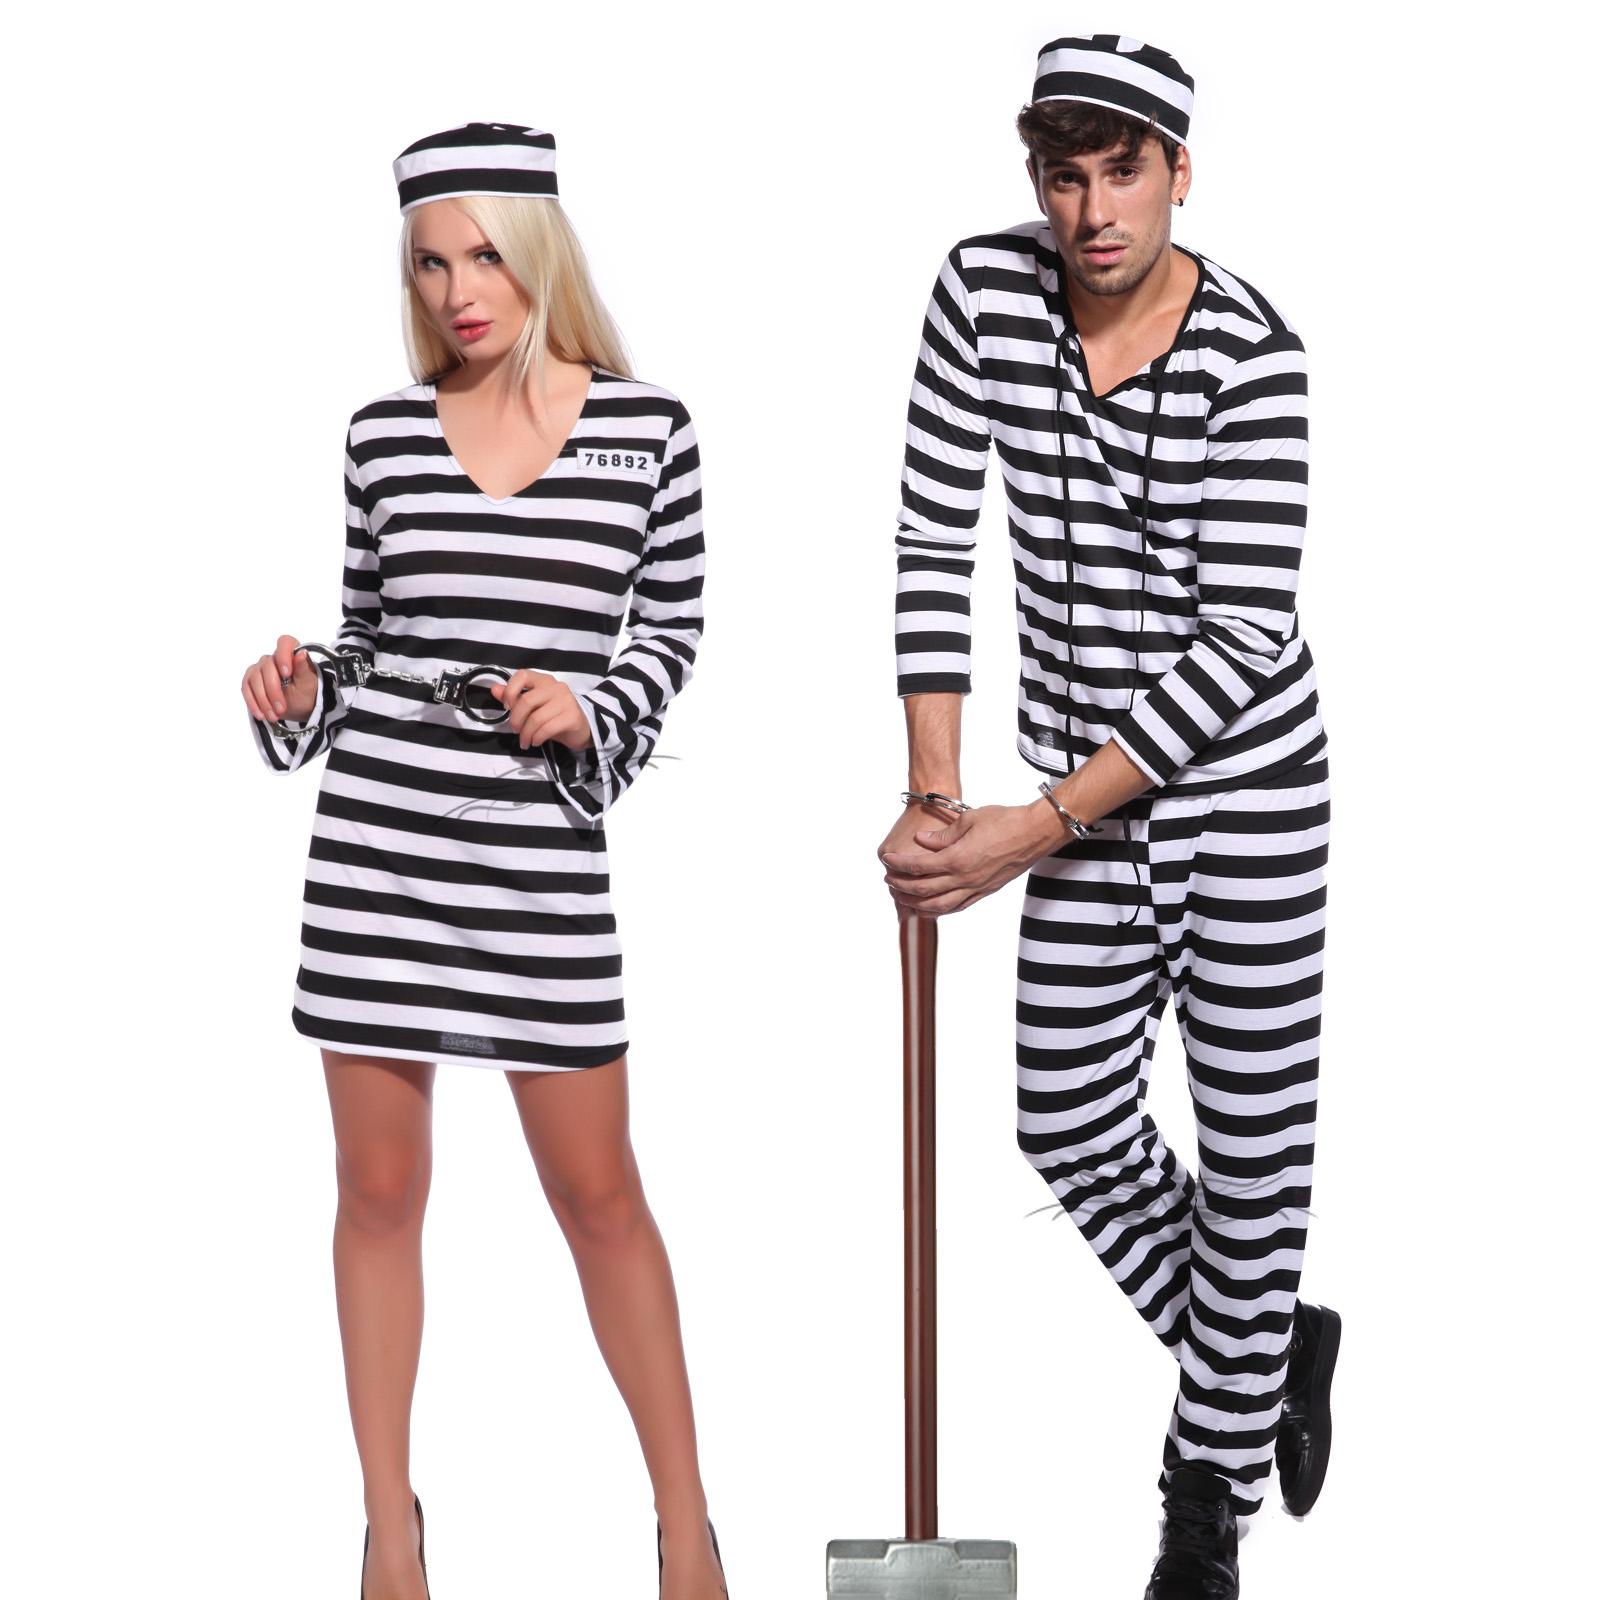 Jail Costume | eBay